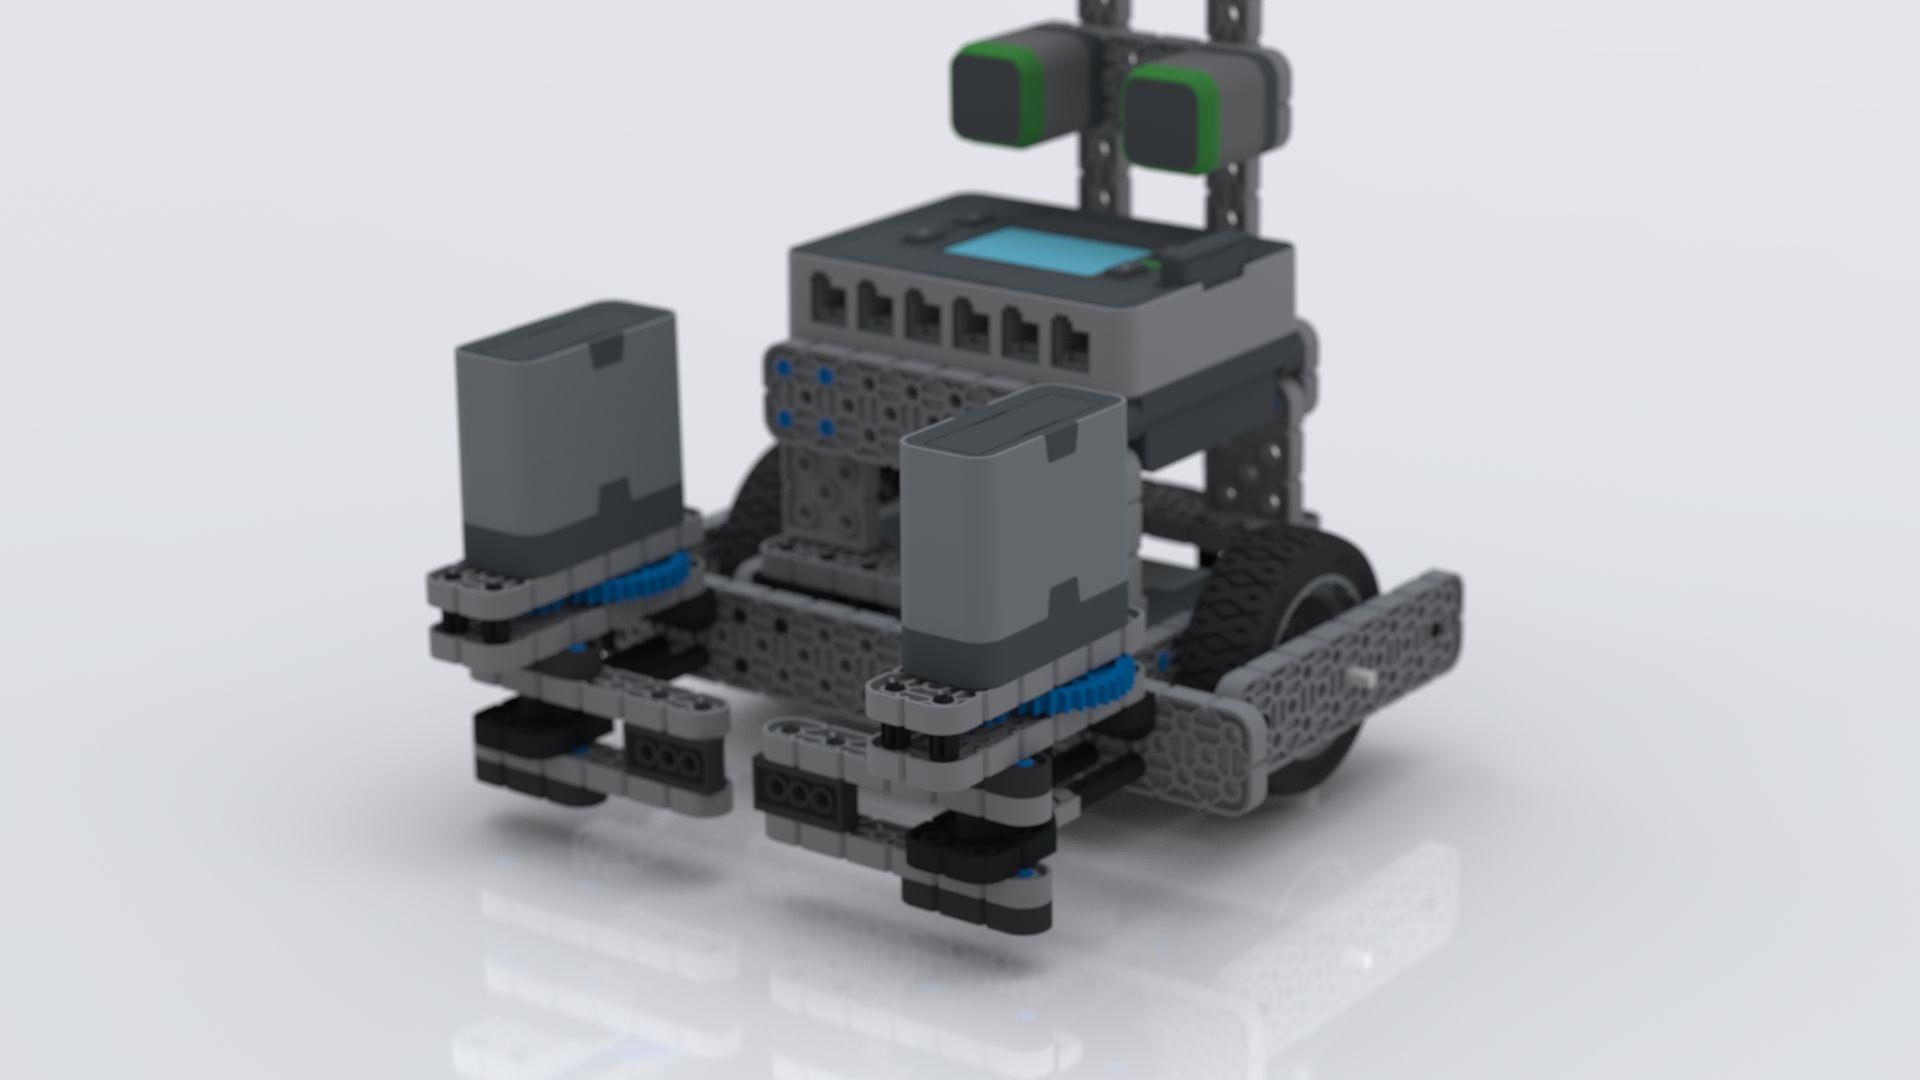 Fabrica-de-nerdes-vex-iq-lucas9-3500-3500